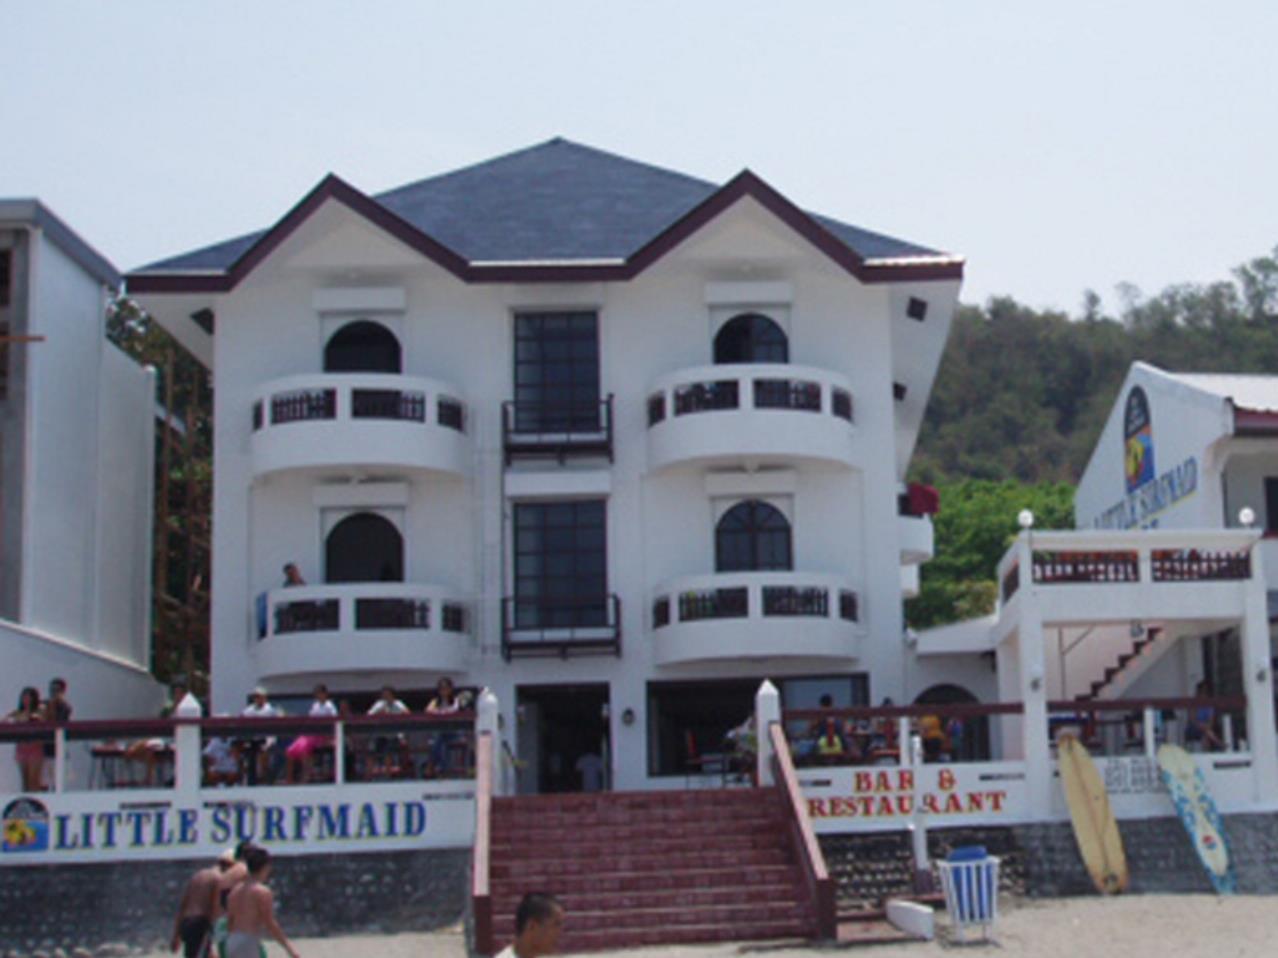 The Little Surfmaid Resort, San Juan